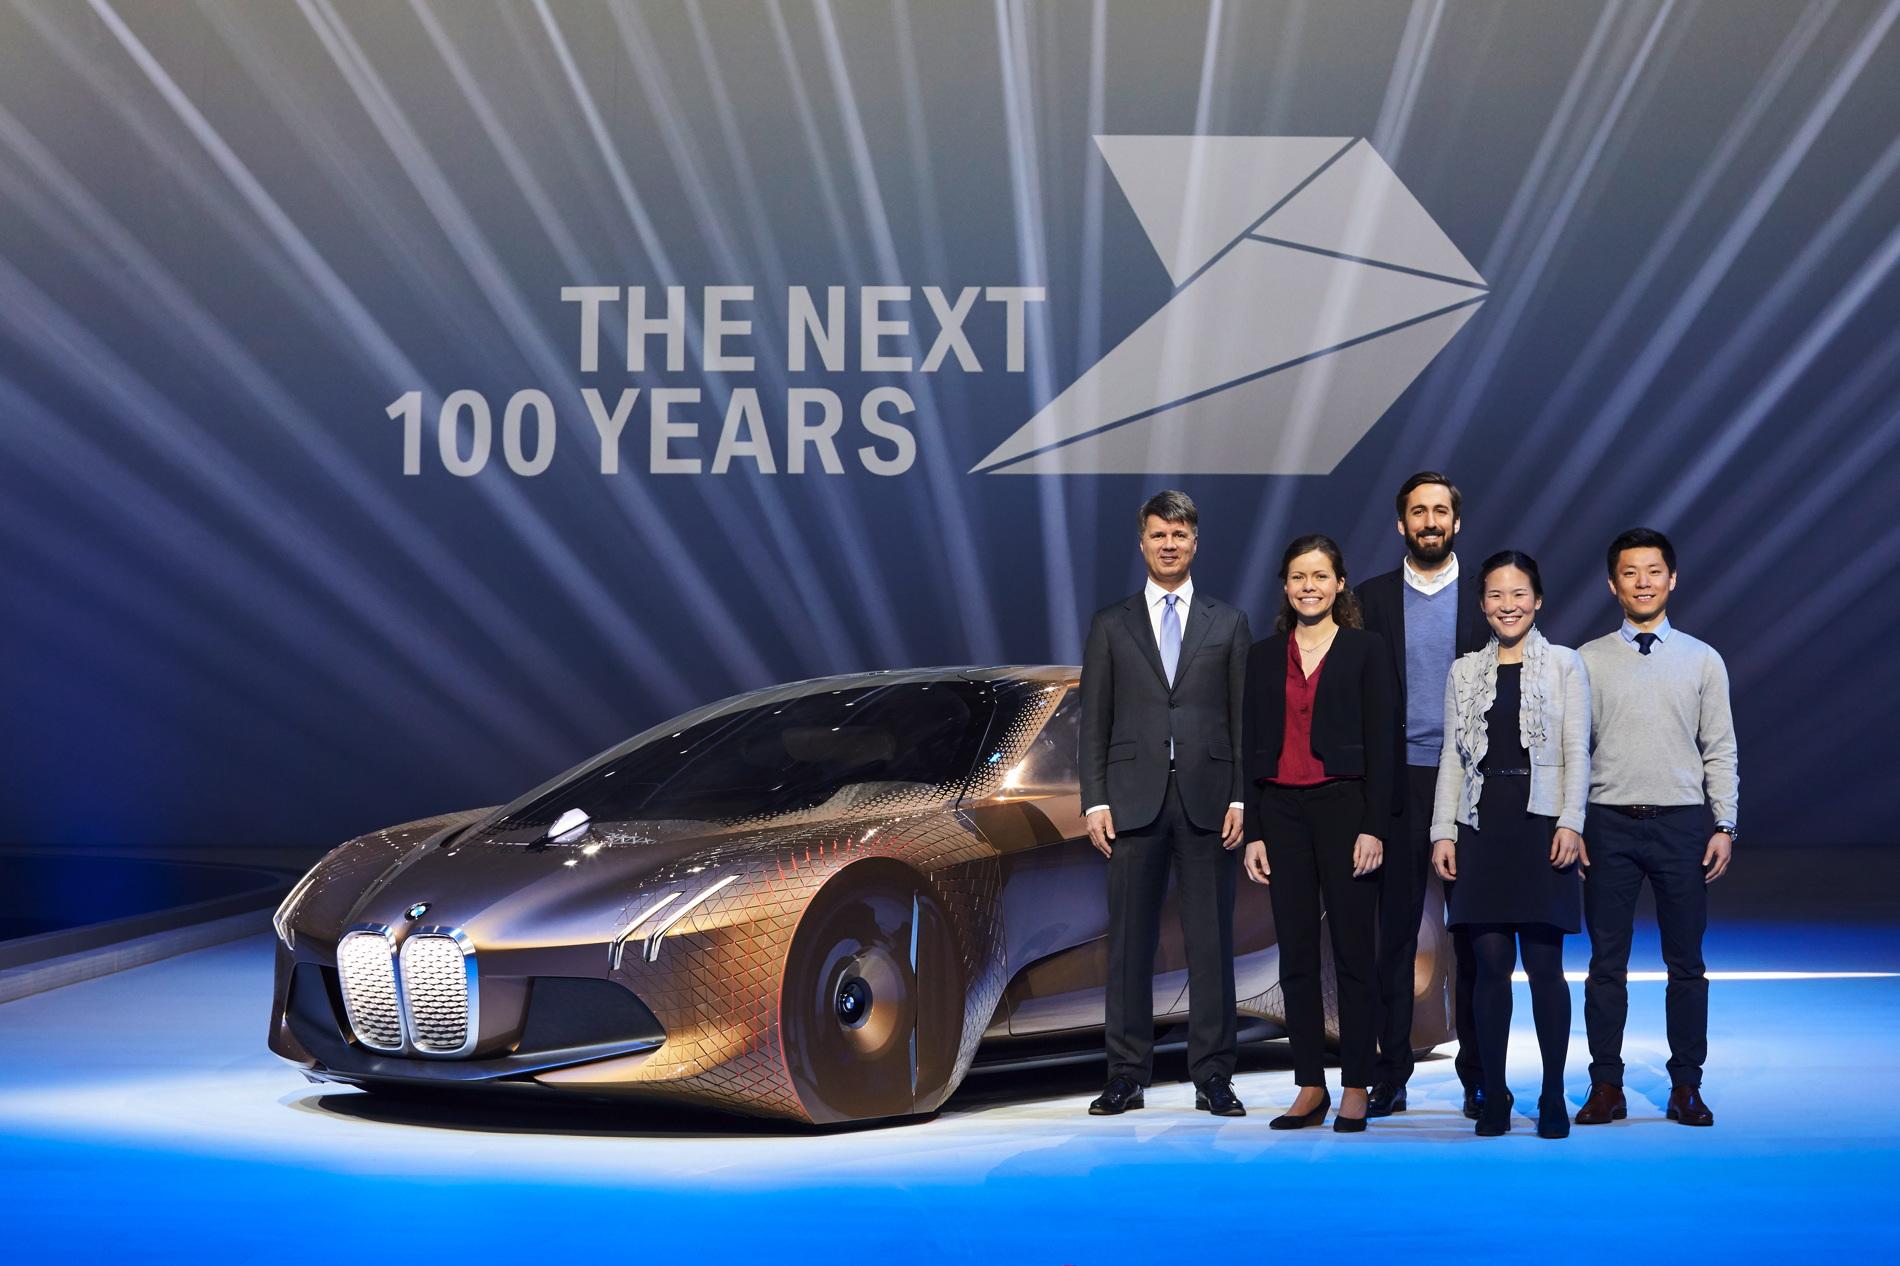 BMW VISION NEXT 100 images 33